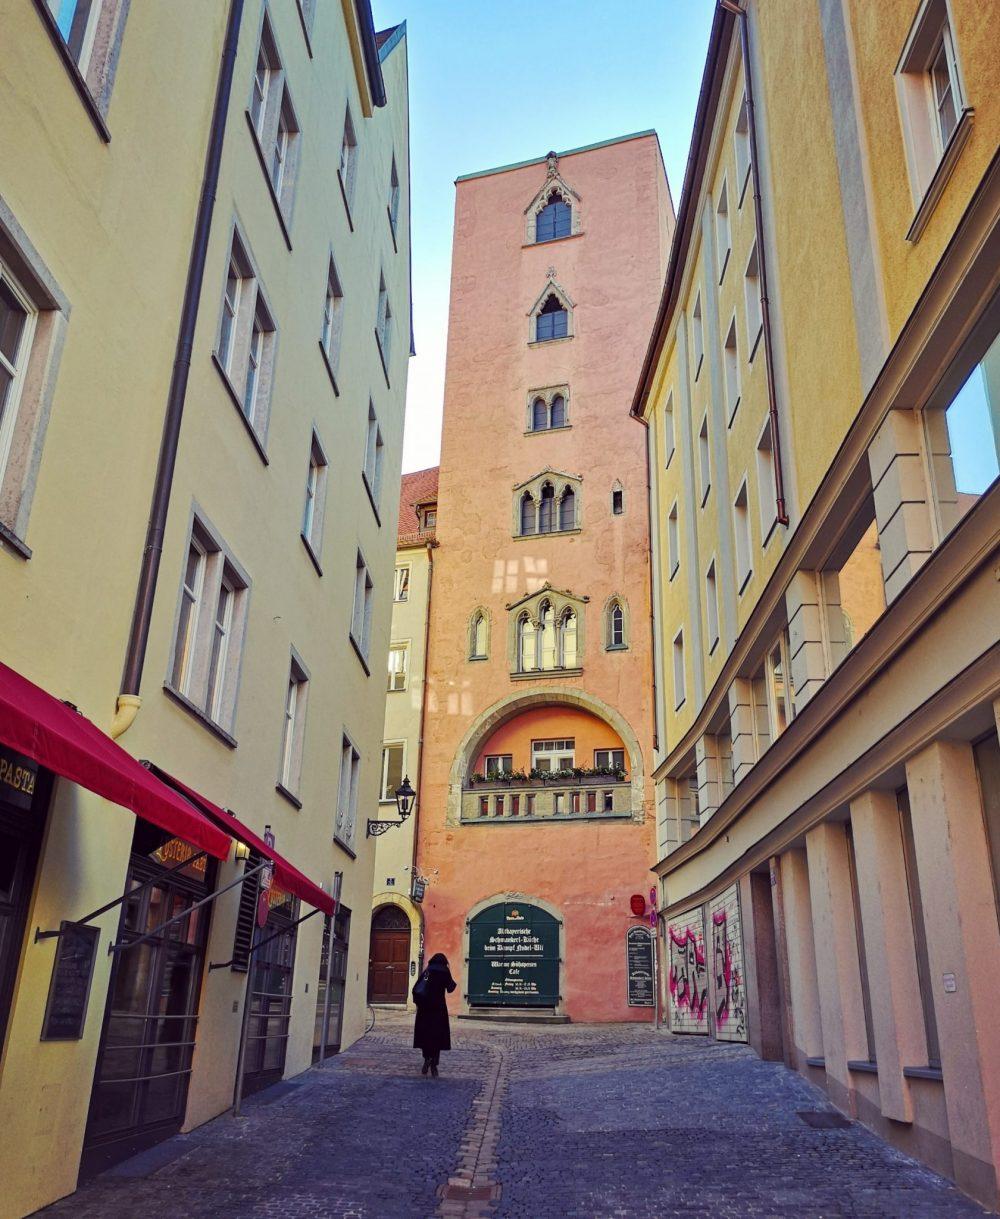 Baumburgerturm Regensburg